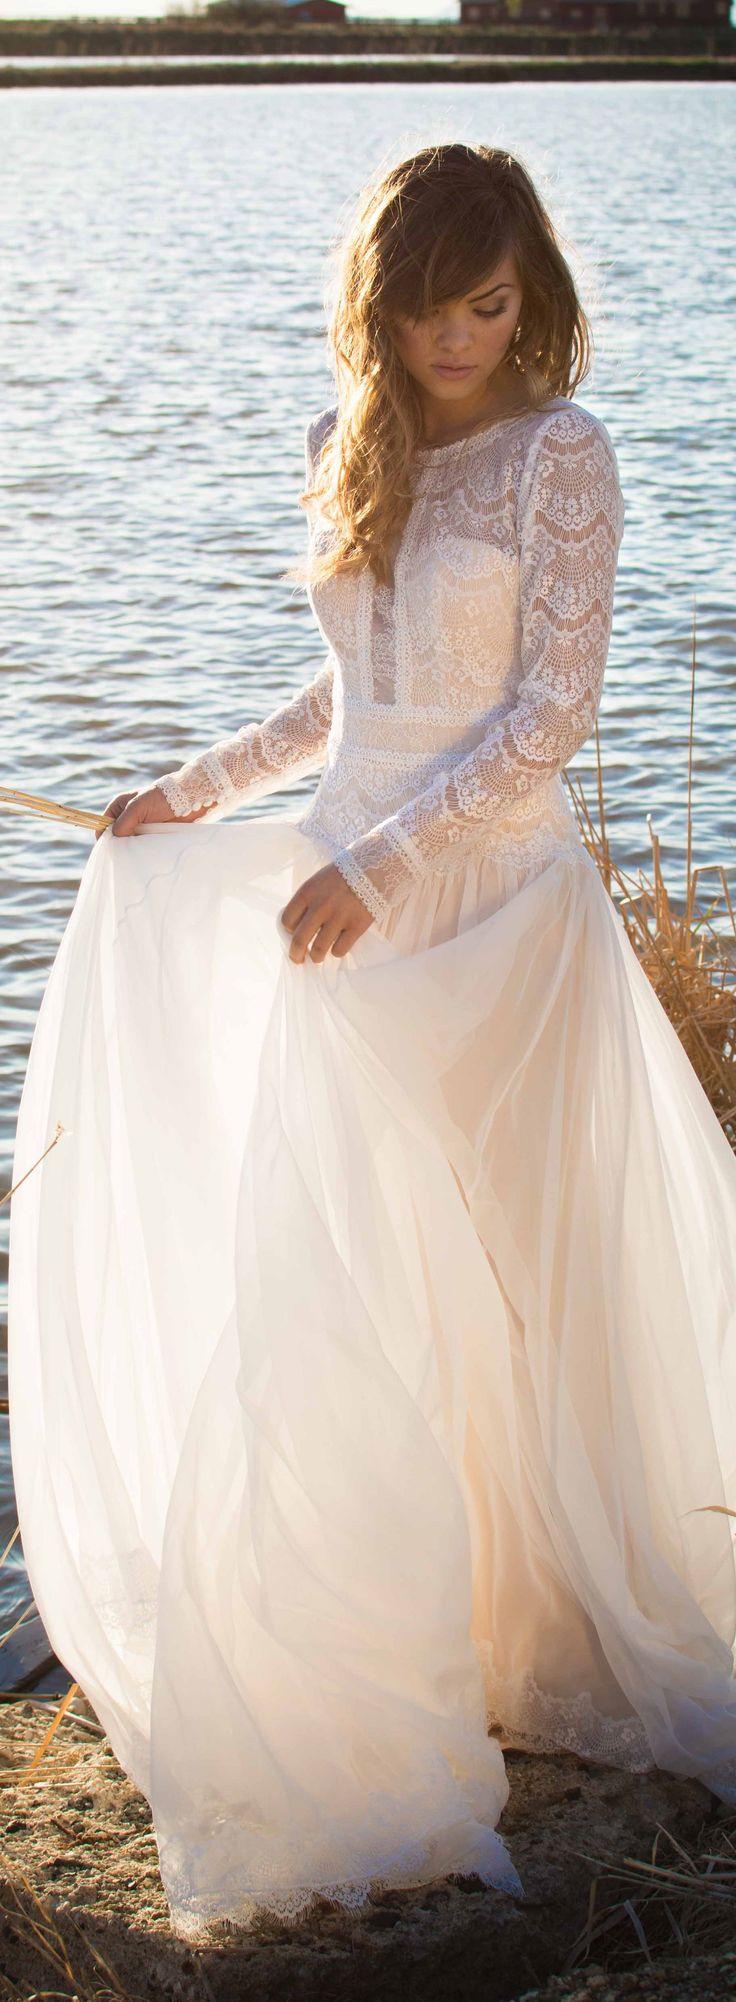 Maggie Sottero 2016 Fall/Winter Collection - Deirdre Wedding Dress | #maggiesottero #maggiebride Hair and photography: @stevenrobertsonhair Styling: @fashnaddict Make Up: @stephstylin